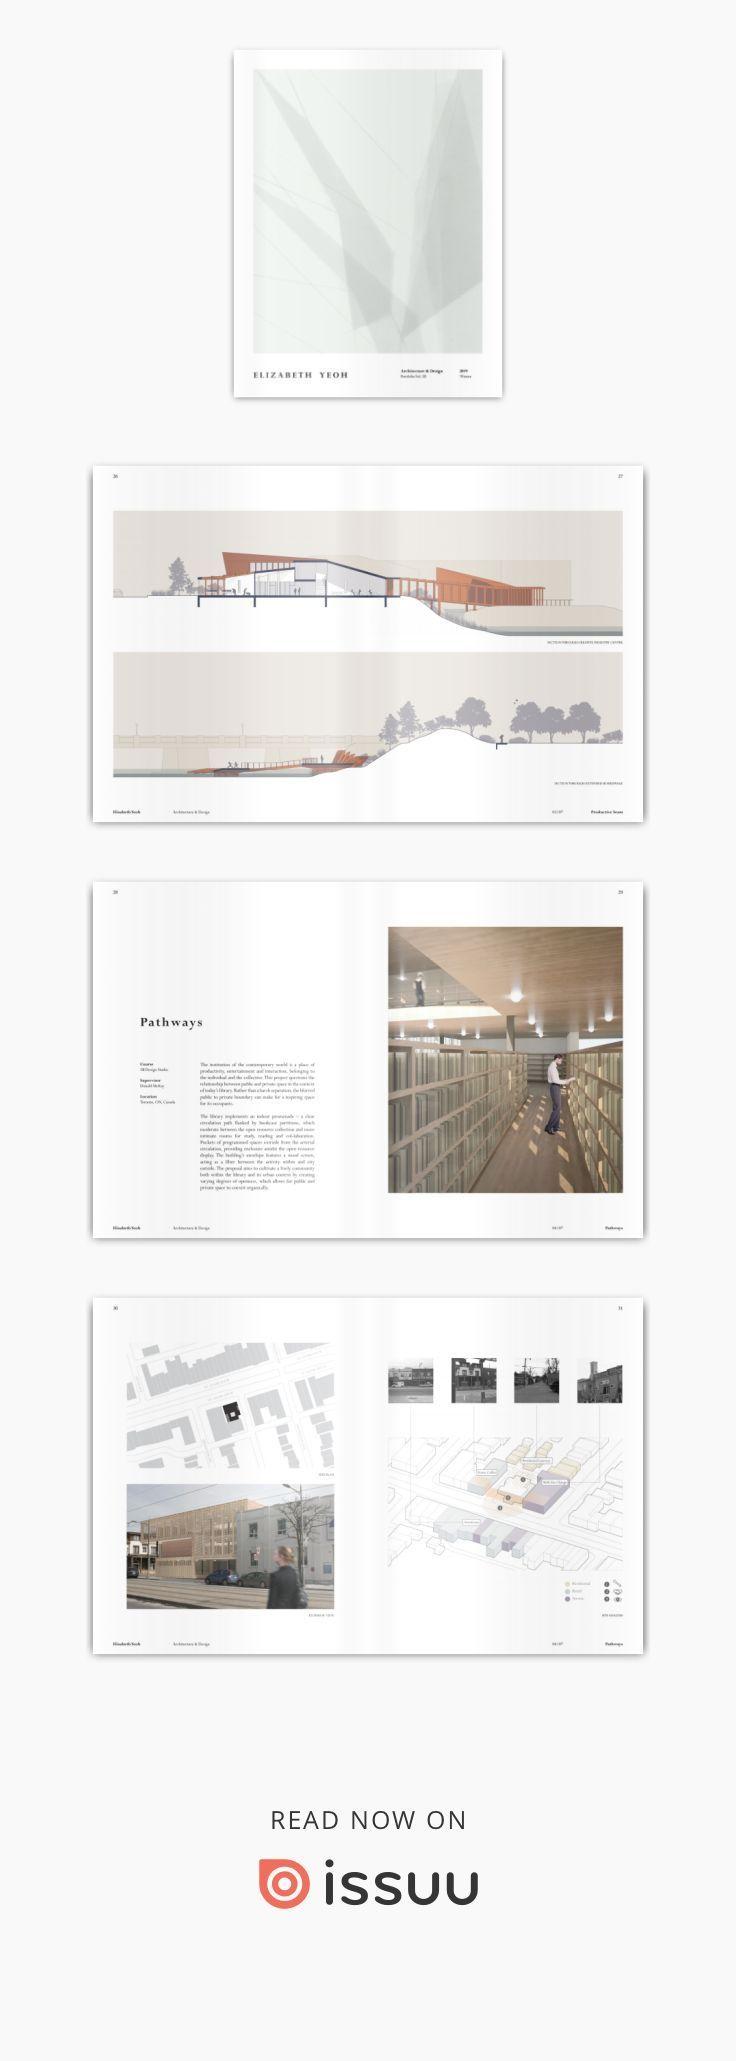 Elizabeth Yeoh   Architecture portfolio design, Architecture ...